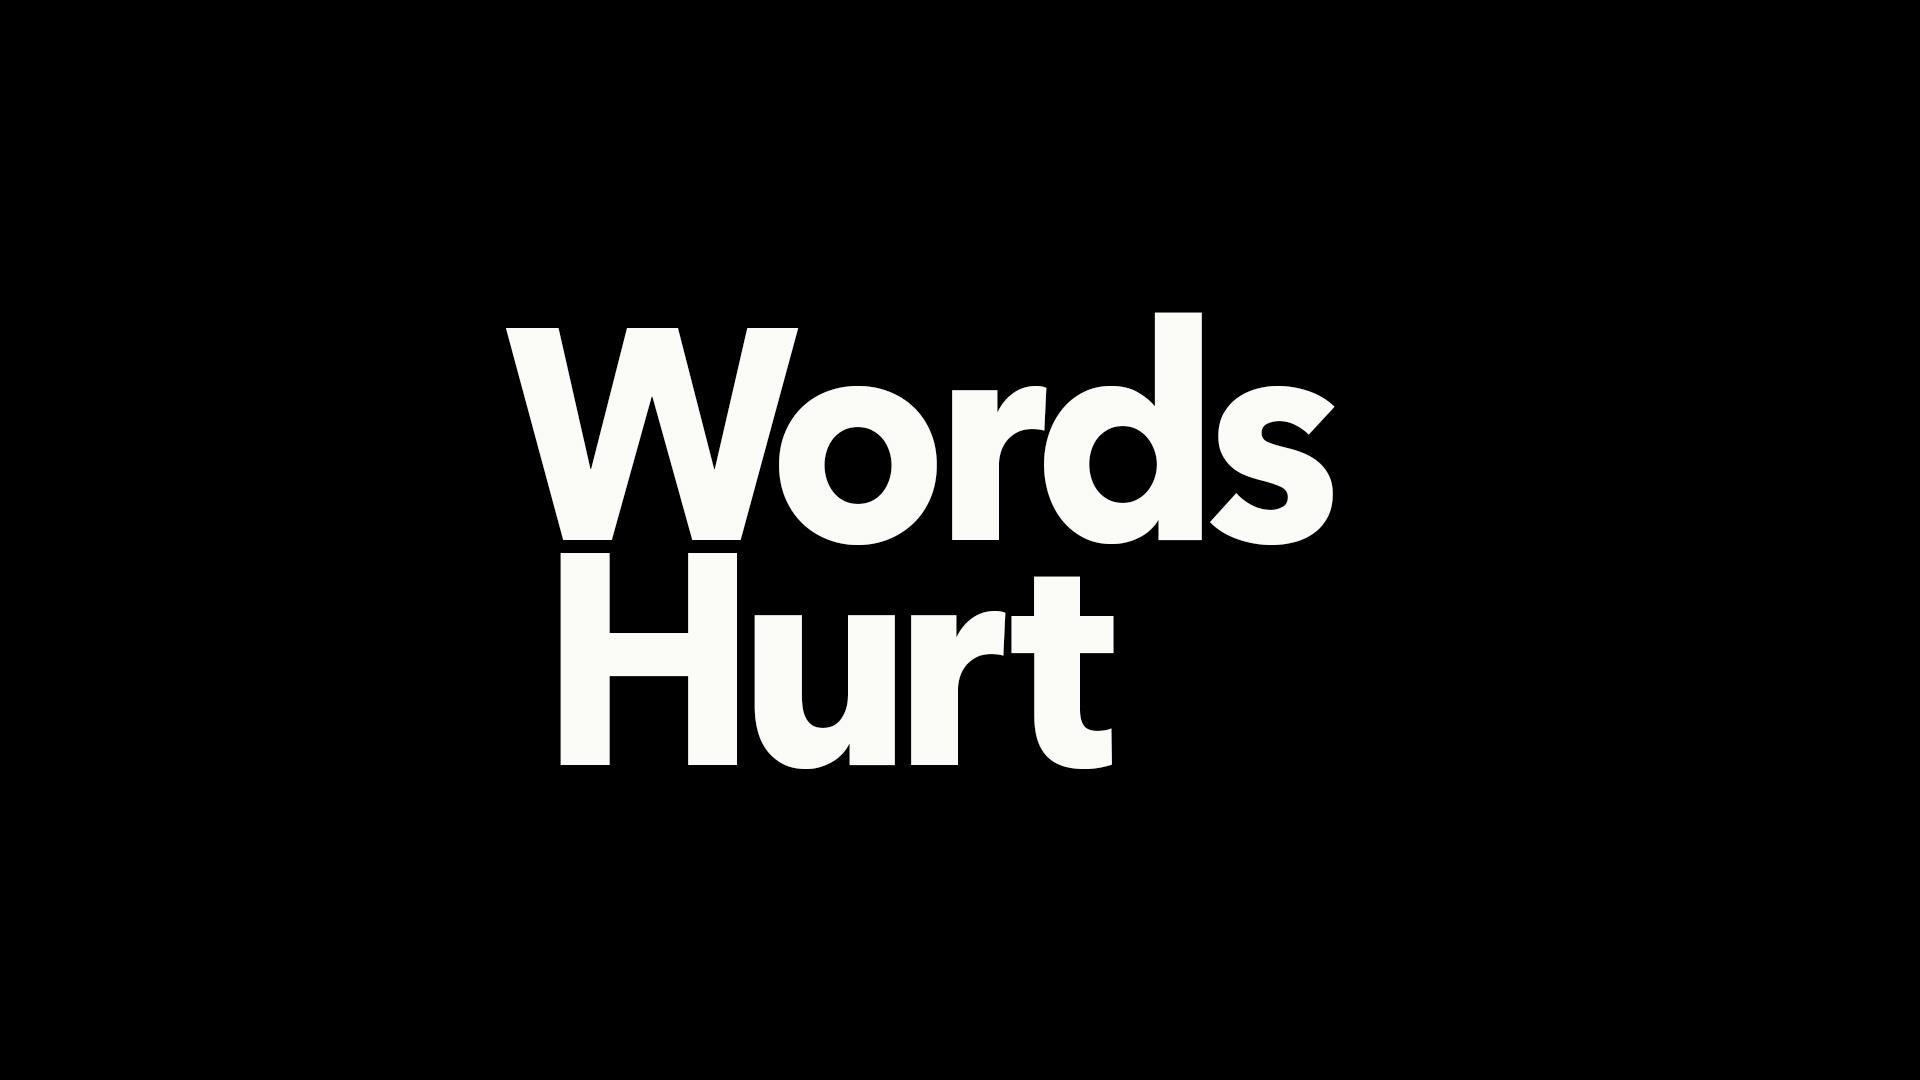 WordsHurt_VideoThumbnail.jpg